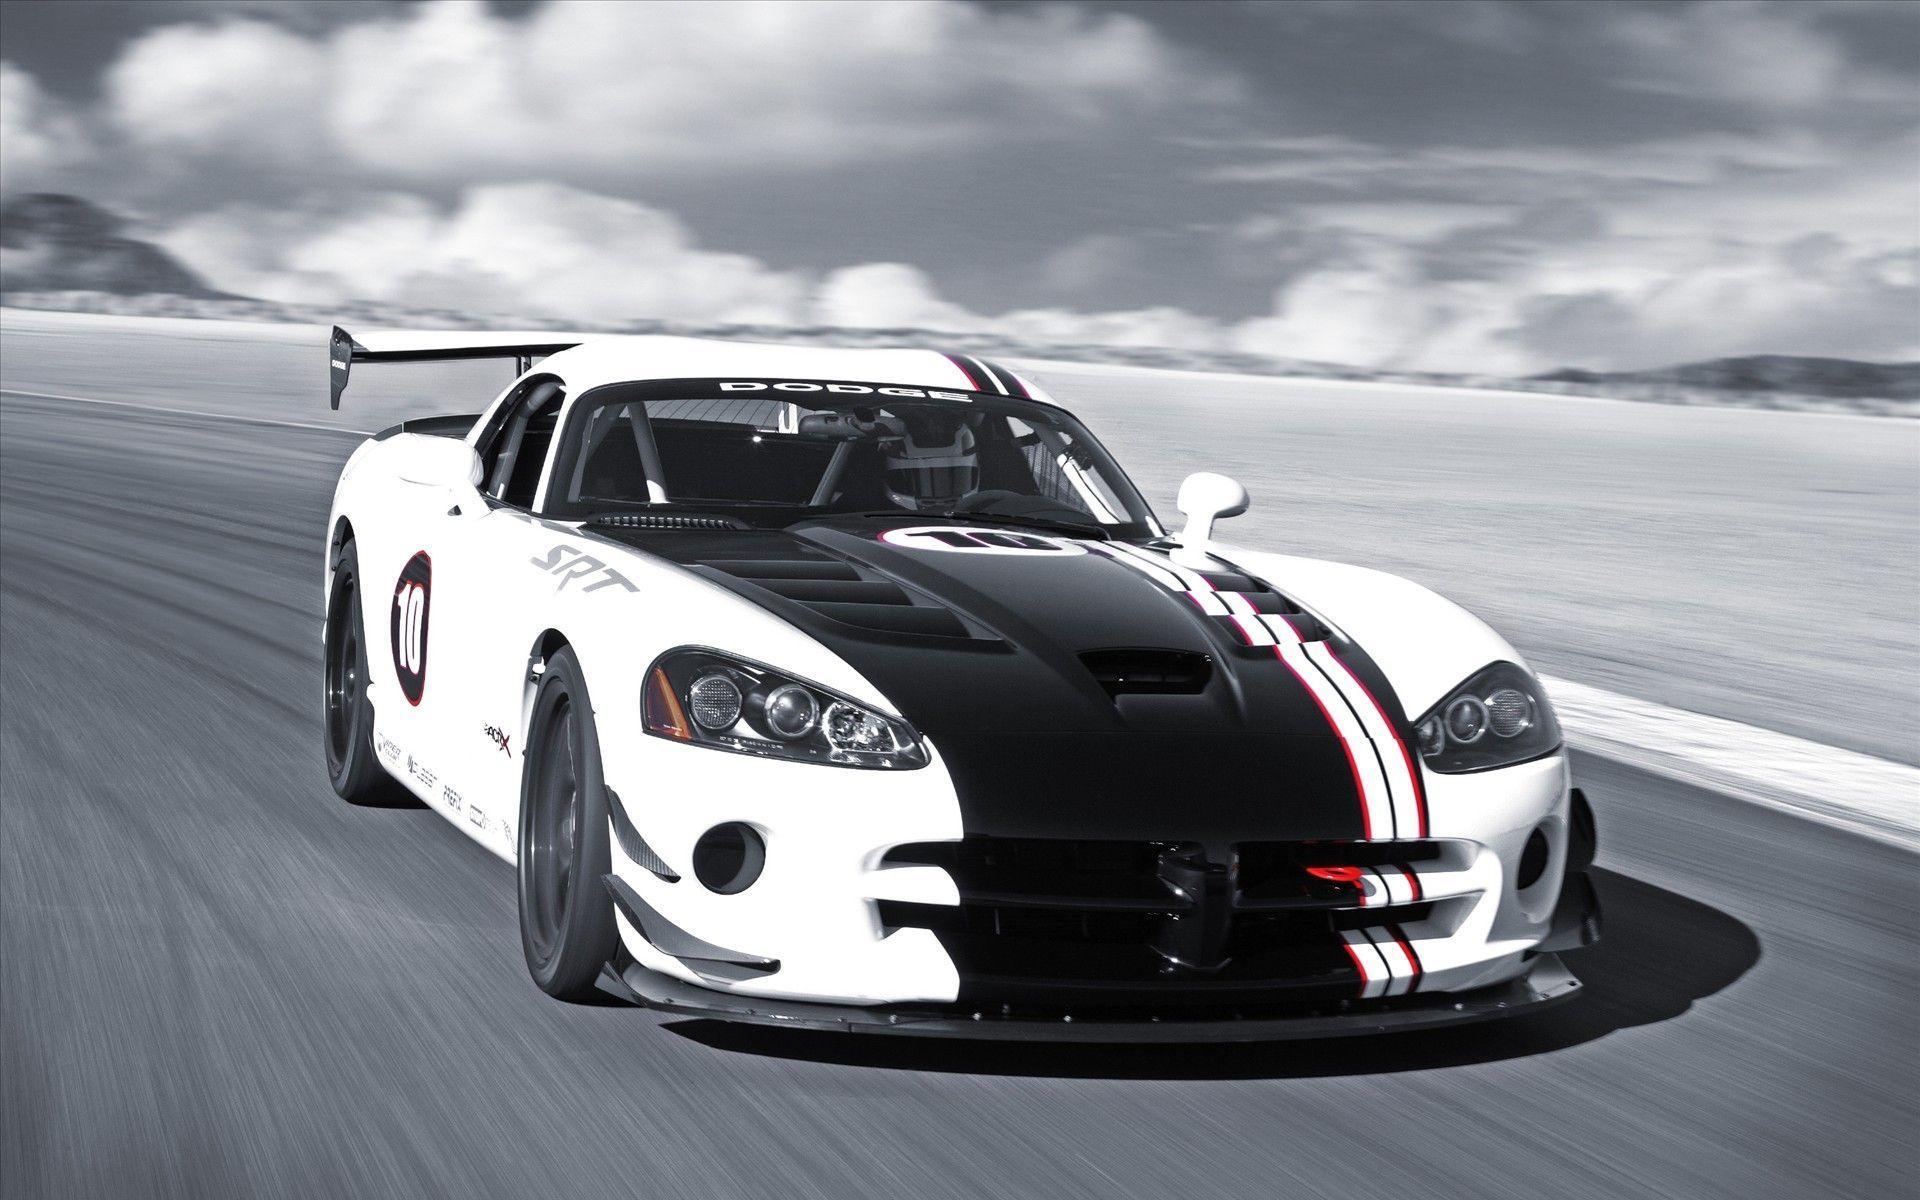 Dodge Viper Wallpapers Top Free Dodge Viper Backgrounds Wallpaperaccess